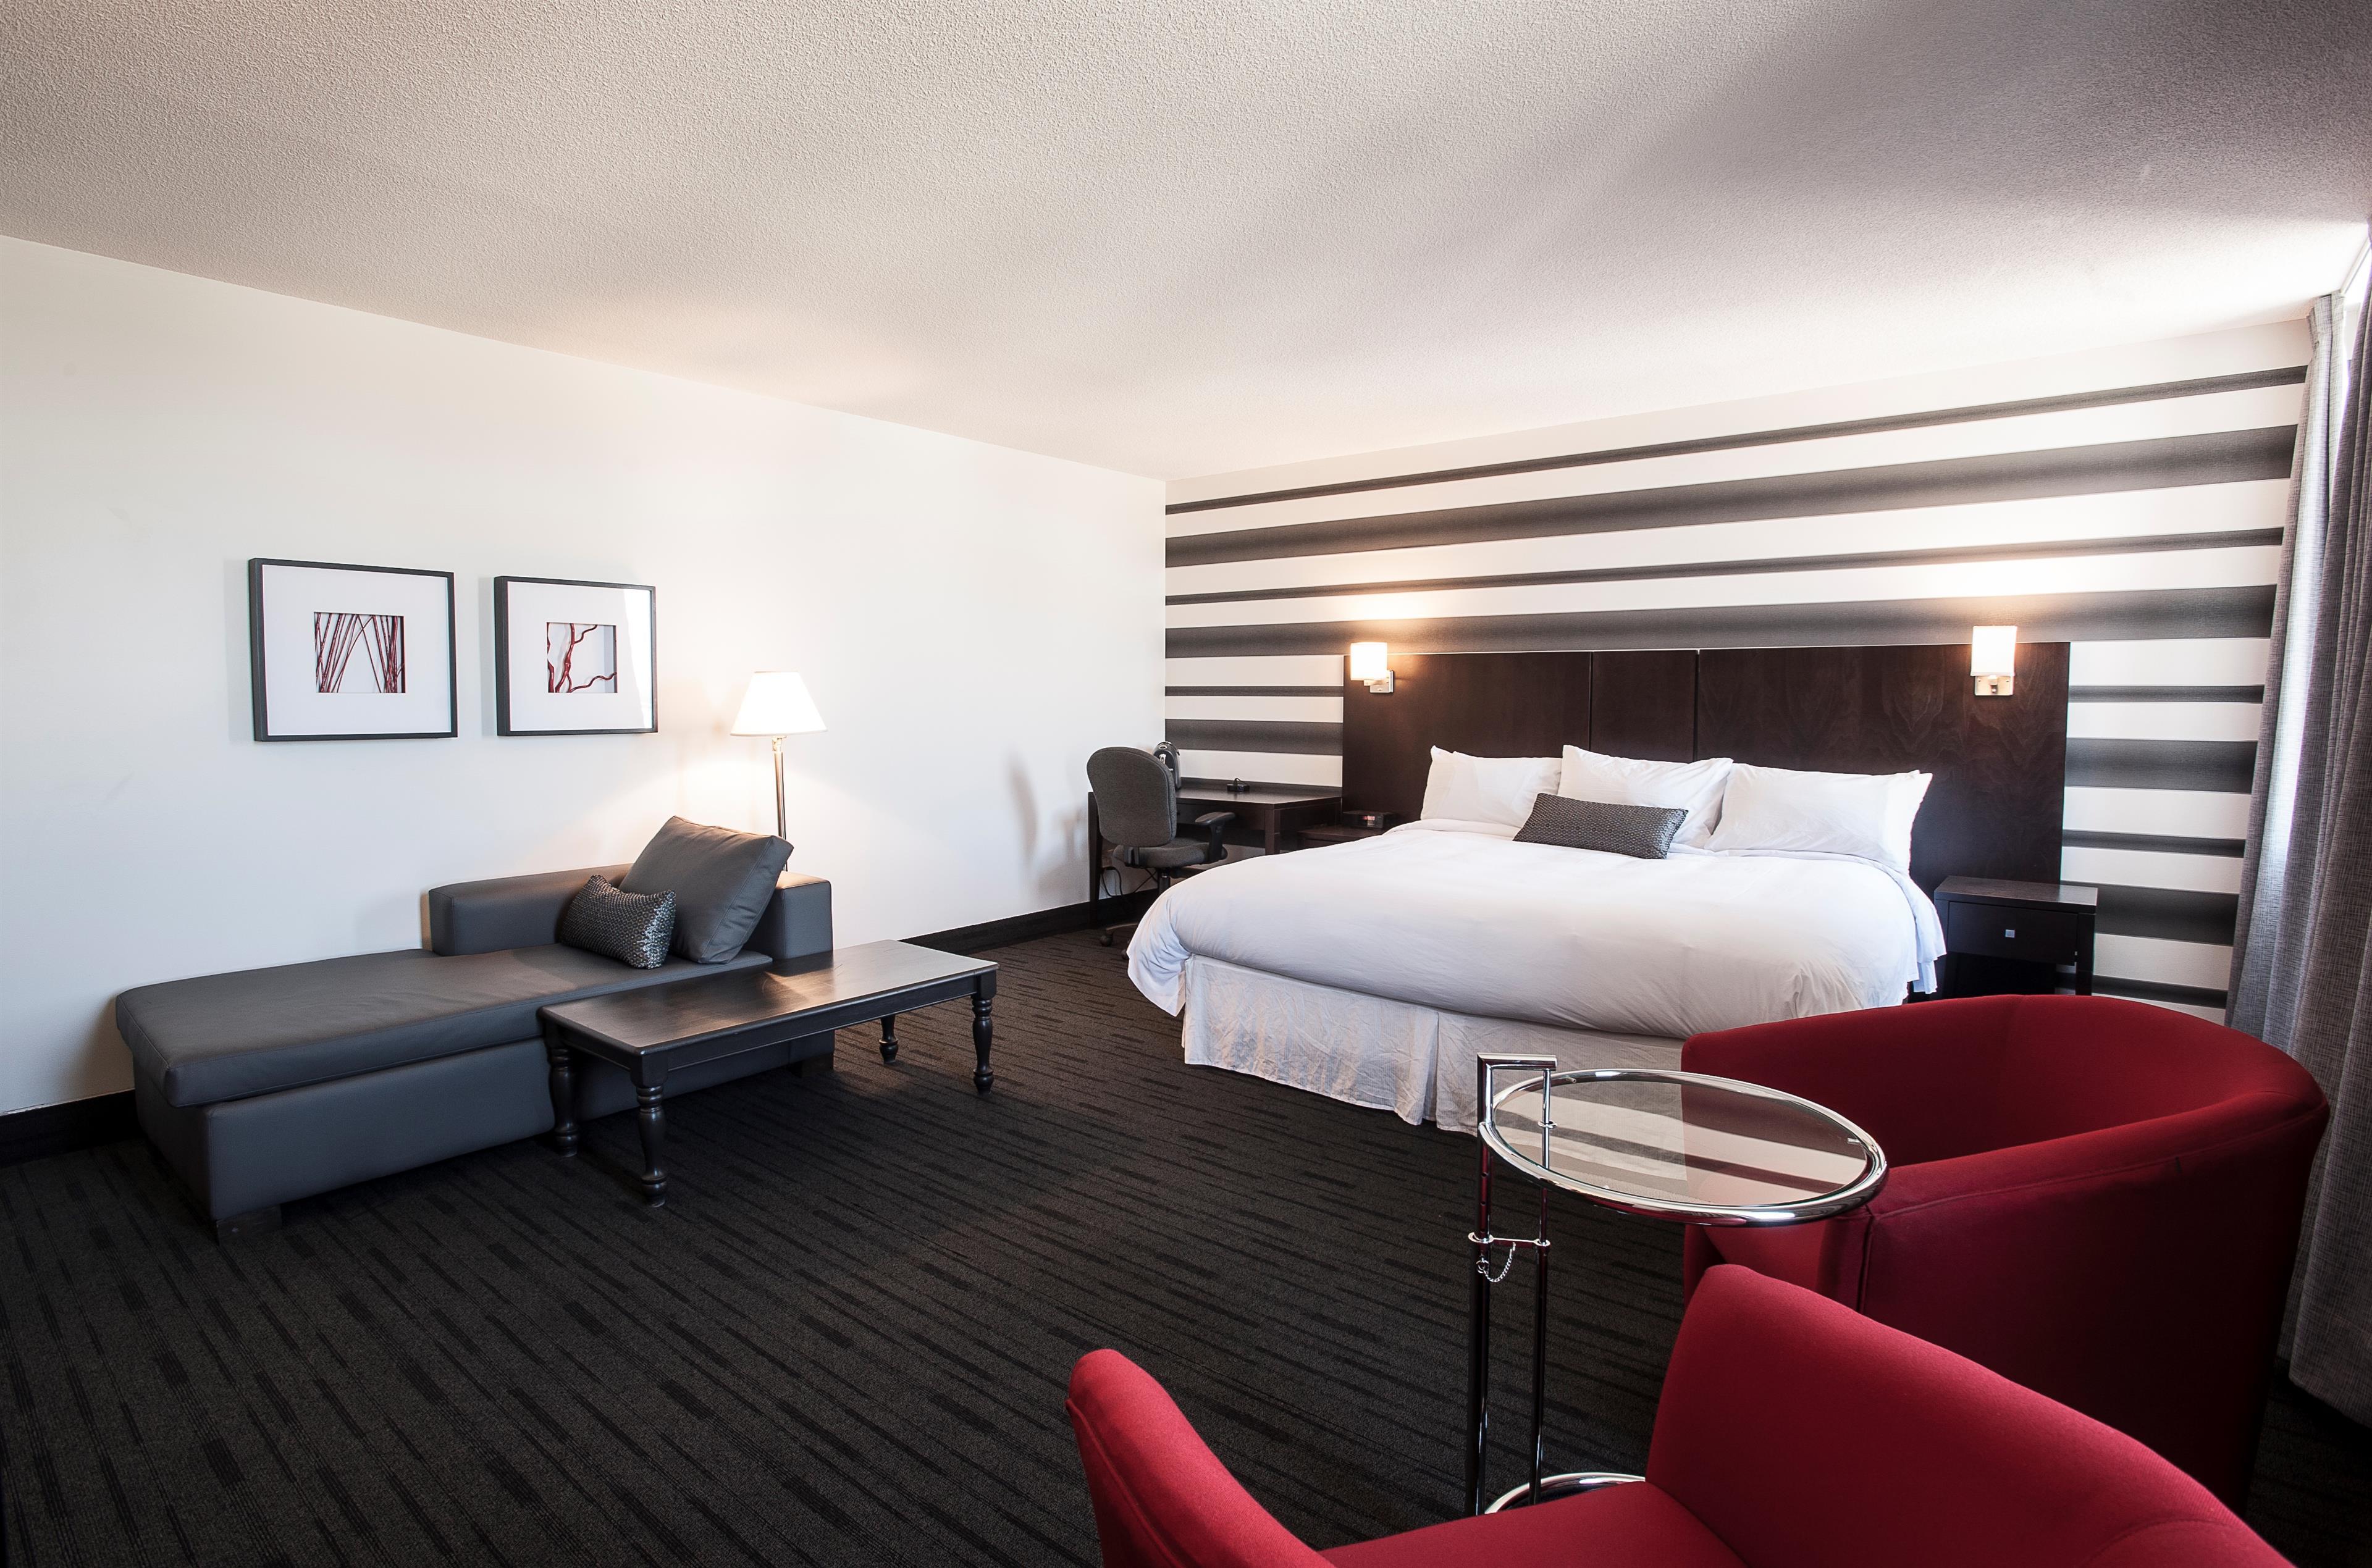 Best Western Plus Hotel Albert Rouyn-Noranda à Rouyn-Noranda: Deluxe King Bed Guest Room